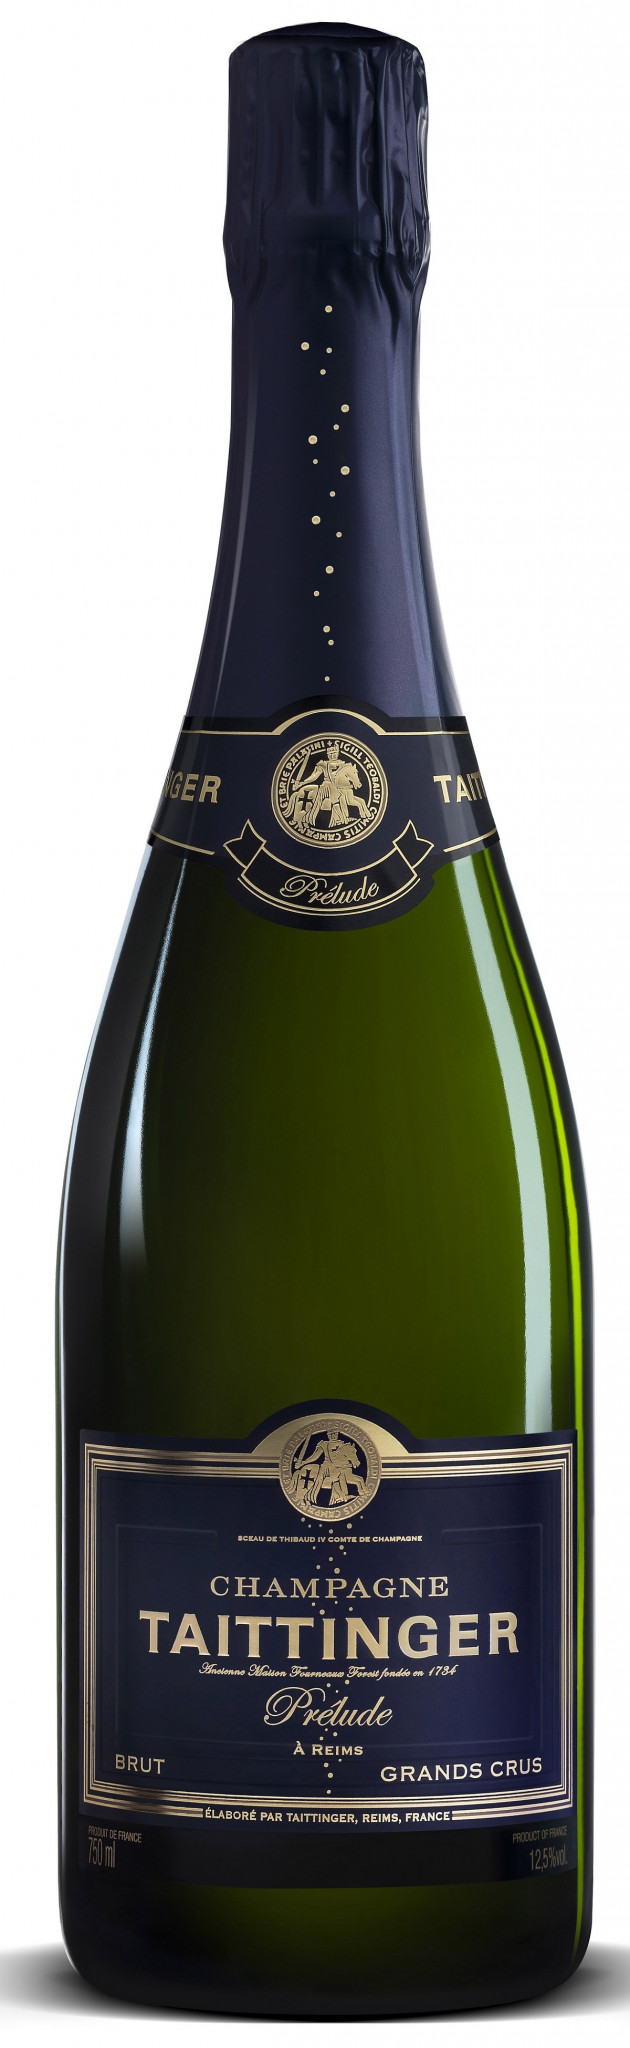 Champagne Taittinger Prélude